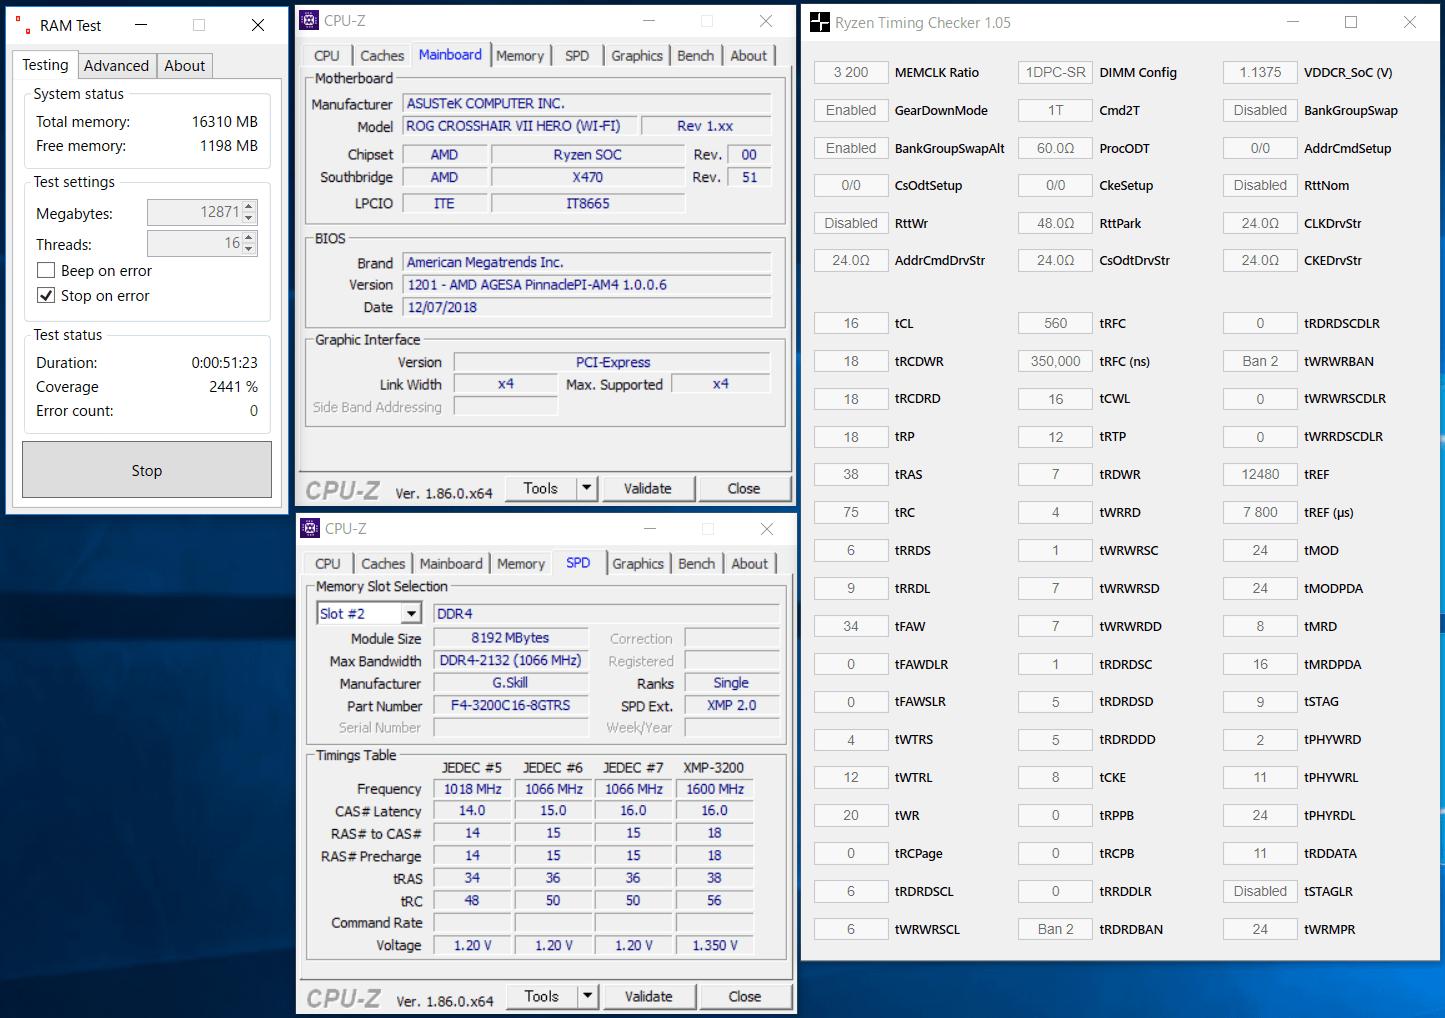 F4-3200C16D-16GTRS_OC_BIOS_Ryzen 7 2700X_X470 (2)